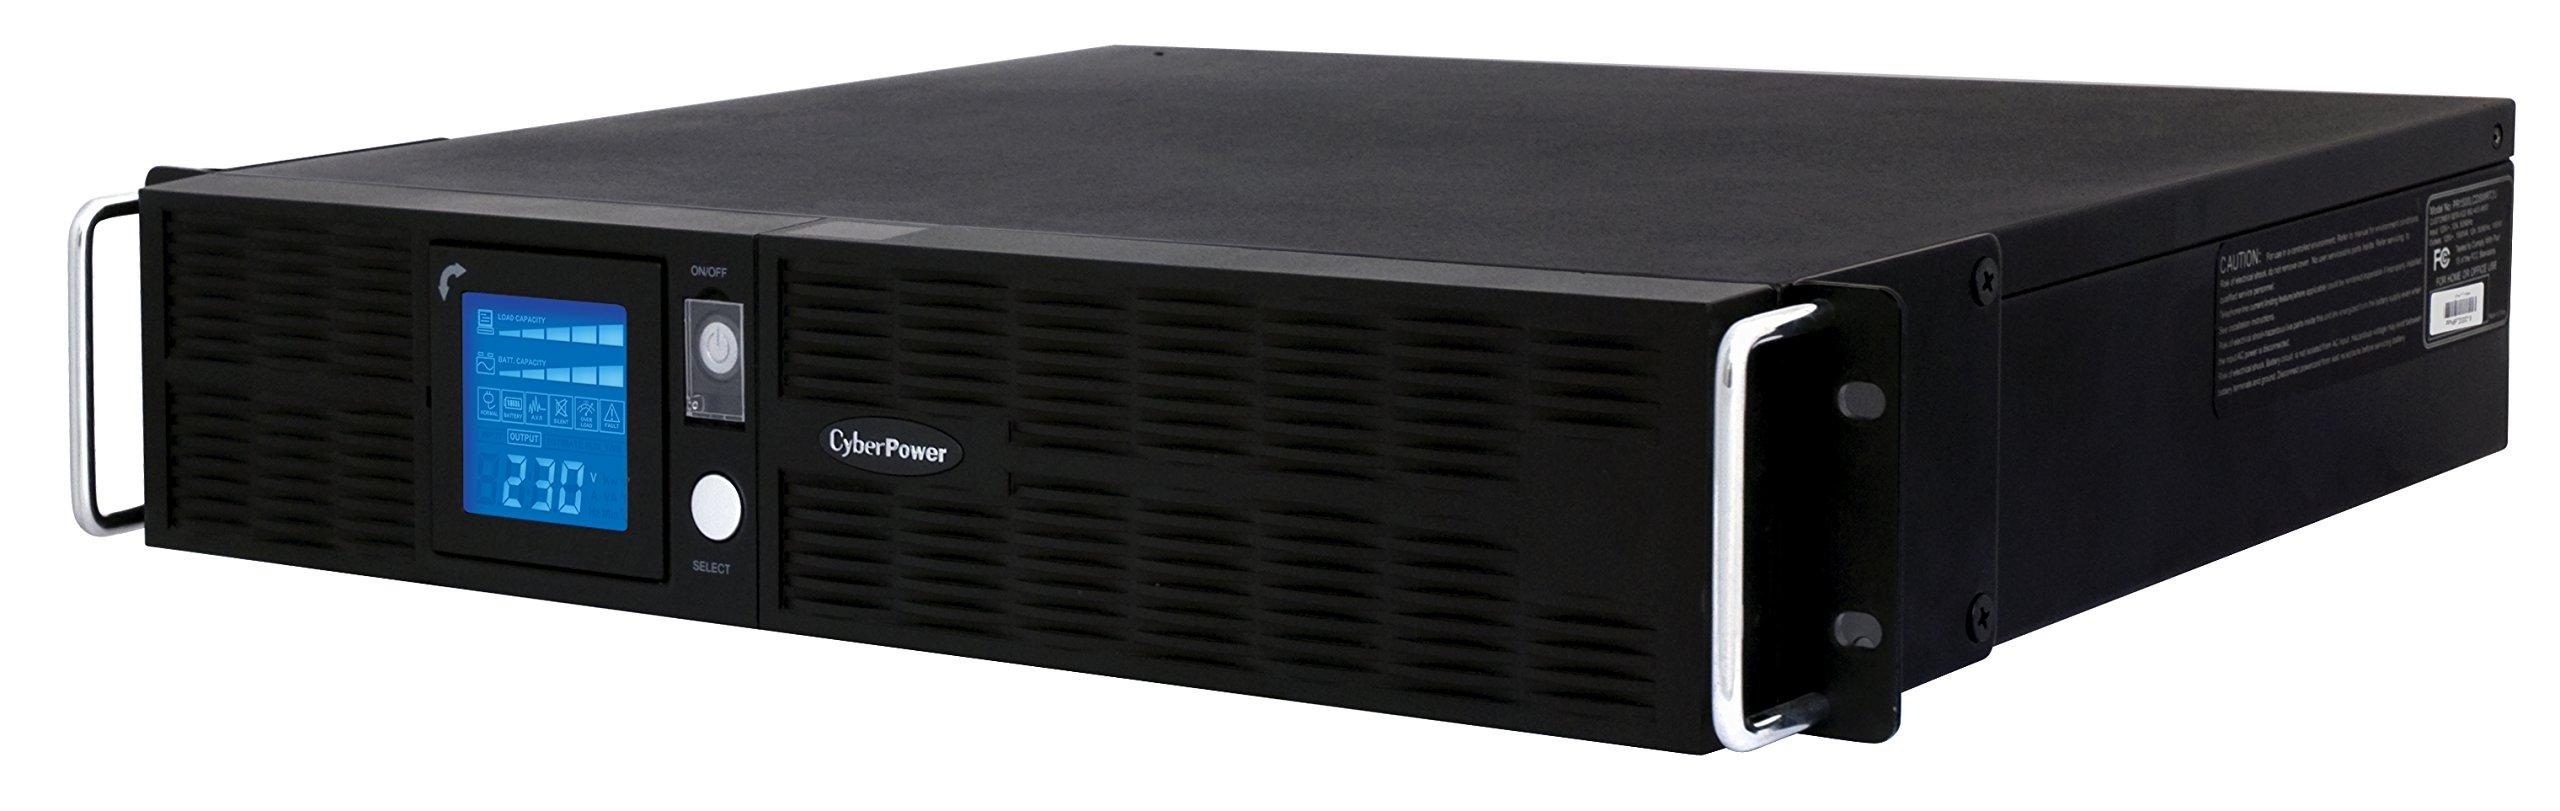 CyberPower PR1000ELCDRT2U High-Voltage Smart App Sinewave UPS System, 1000VA/900W, 8 Outlets, AVR, 2U Rack/Tower